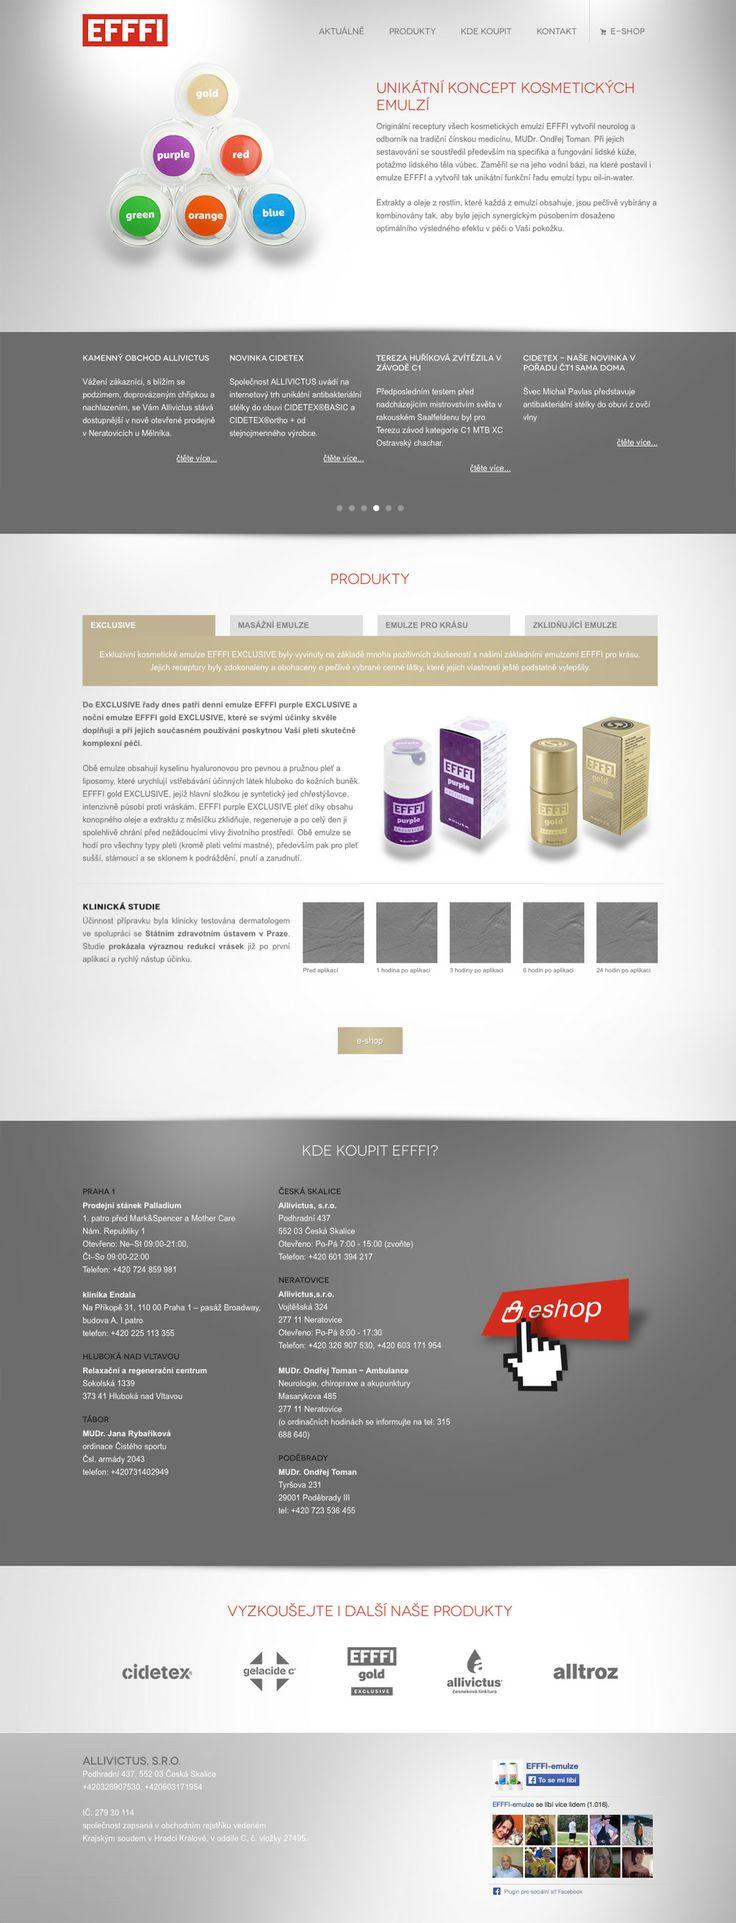 www.efffi.cz #webdesign #eshop #efffi